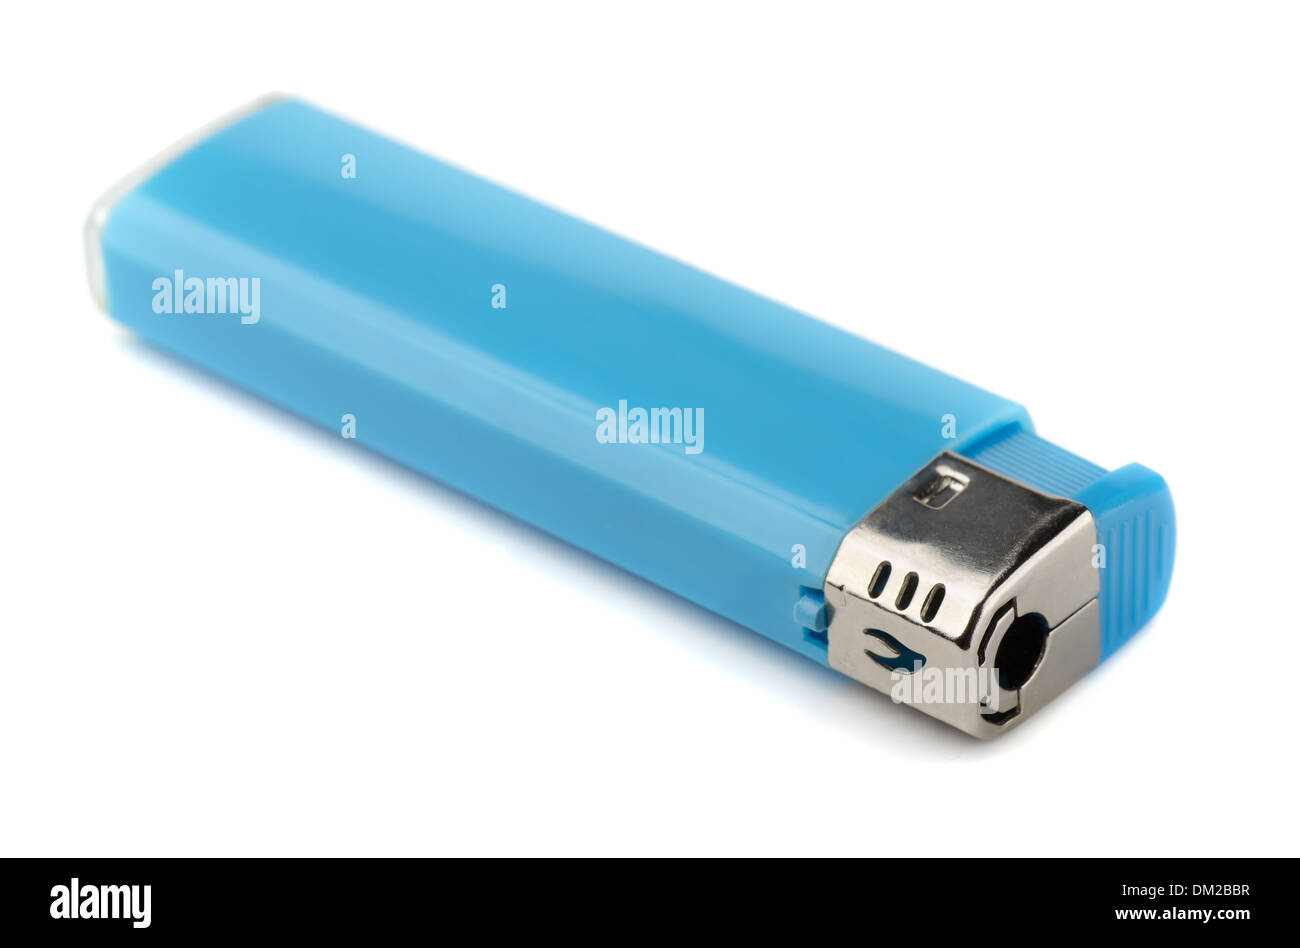 Blue plastic lighter isolated on white - Stock Image